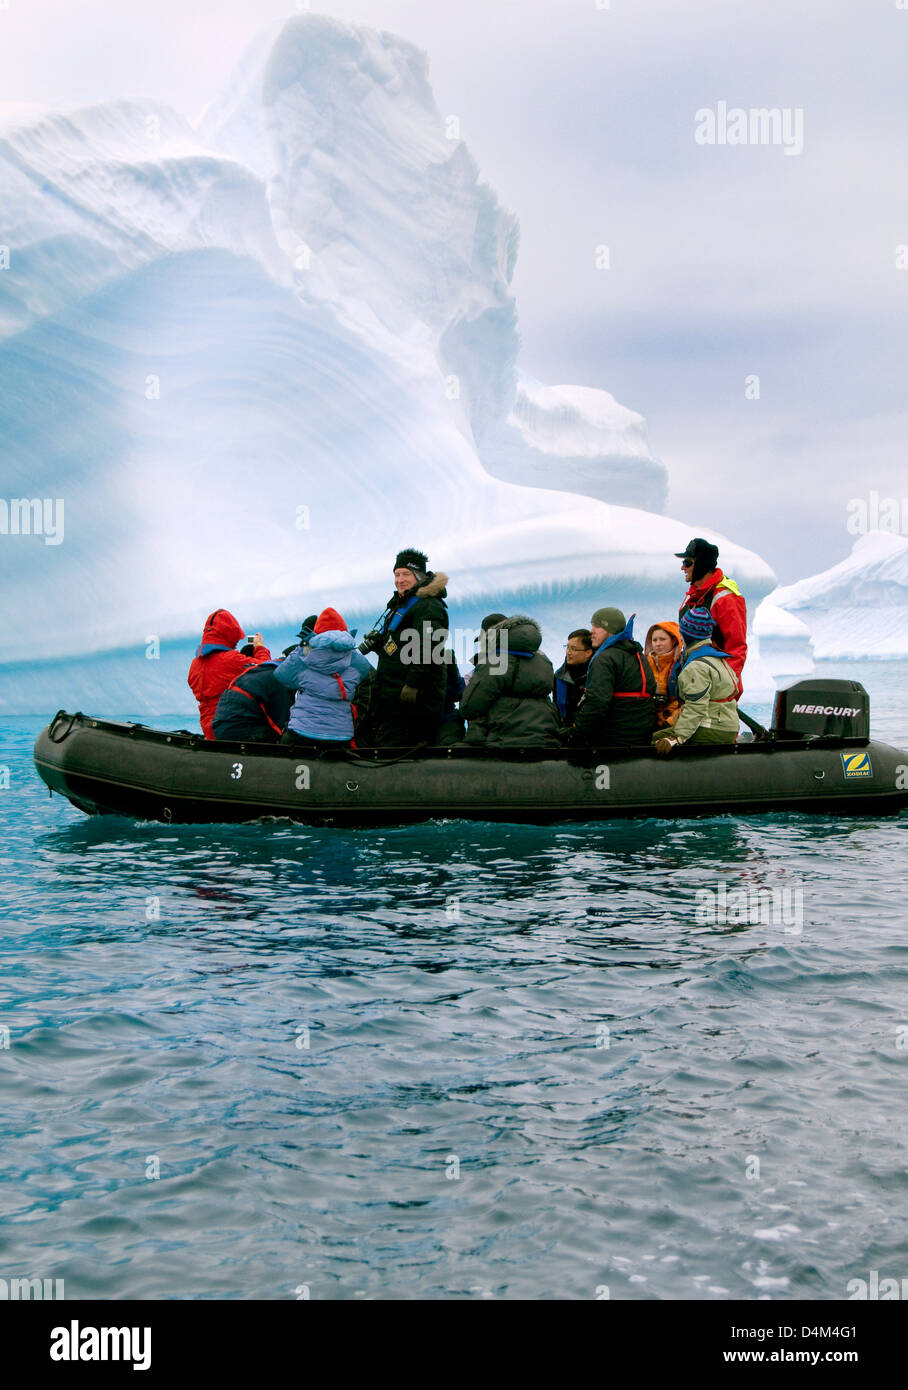 Tourists cruising among icebergs in Antarctica - Stock Image